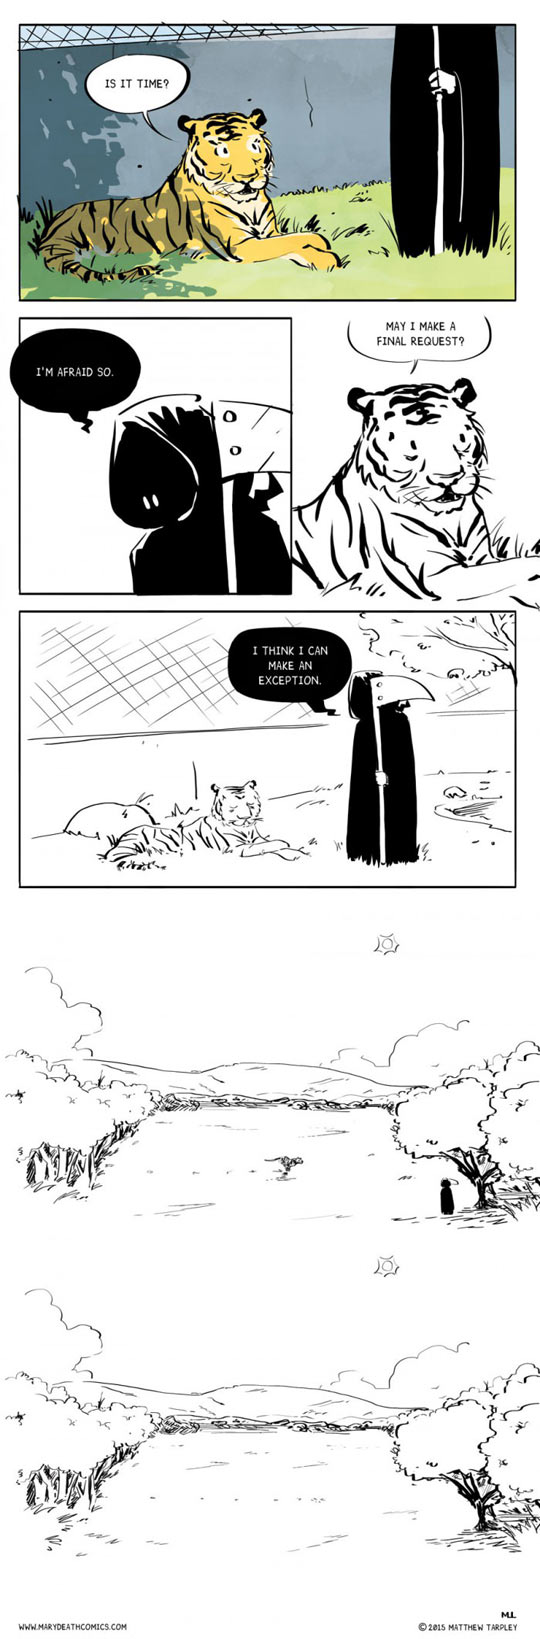 funny-tiger-death-zoo-free-comic